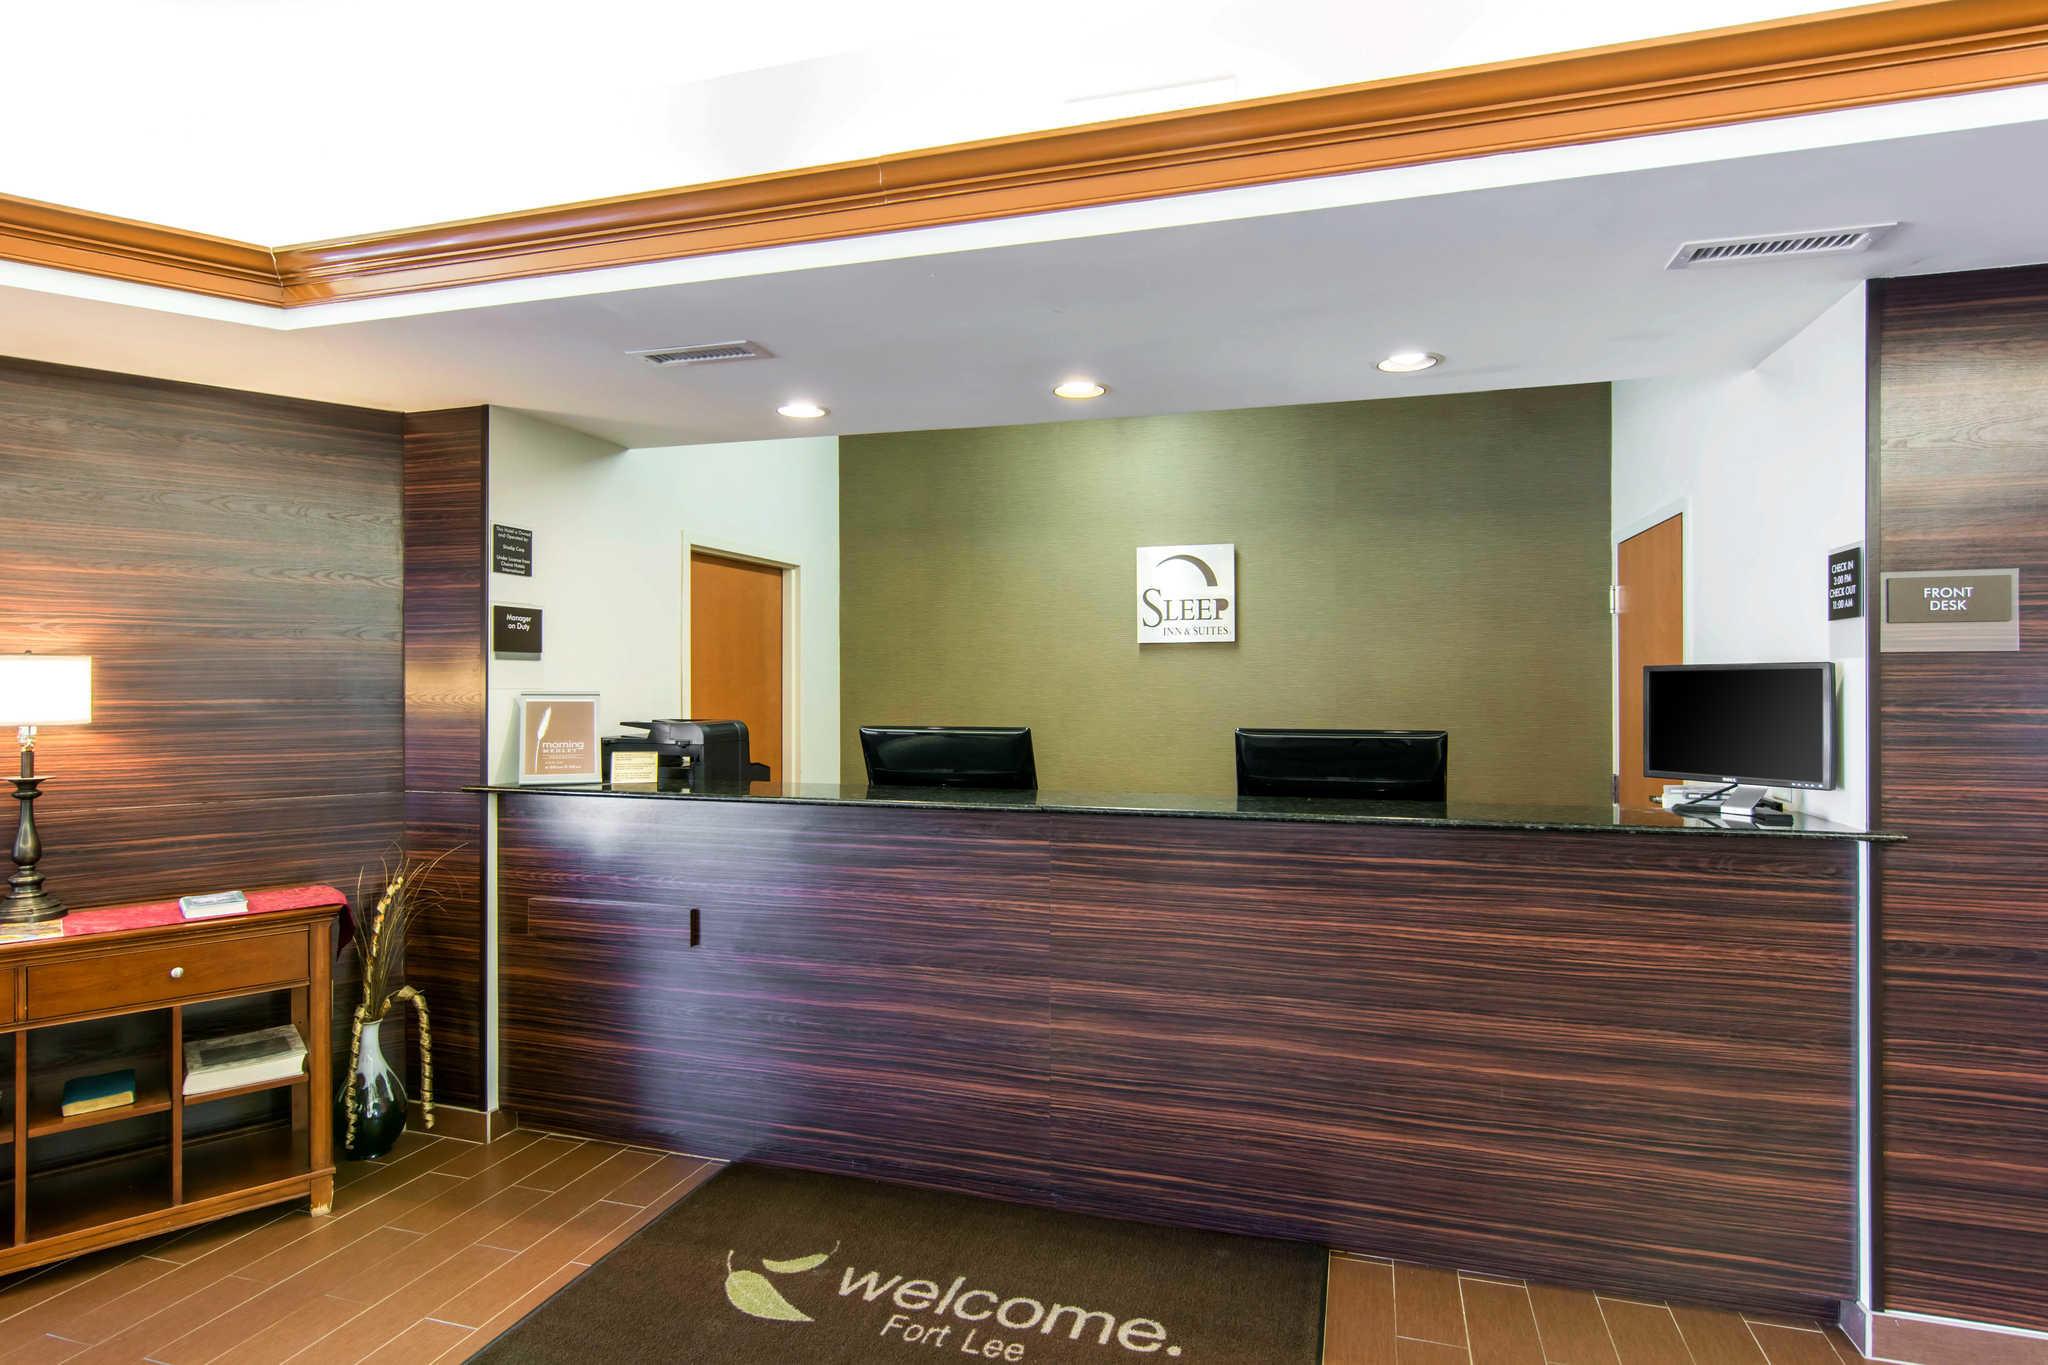 Sleep Inn & Suites At Fort Lee image 7